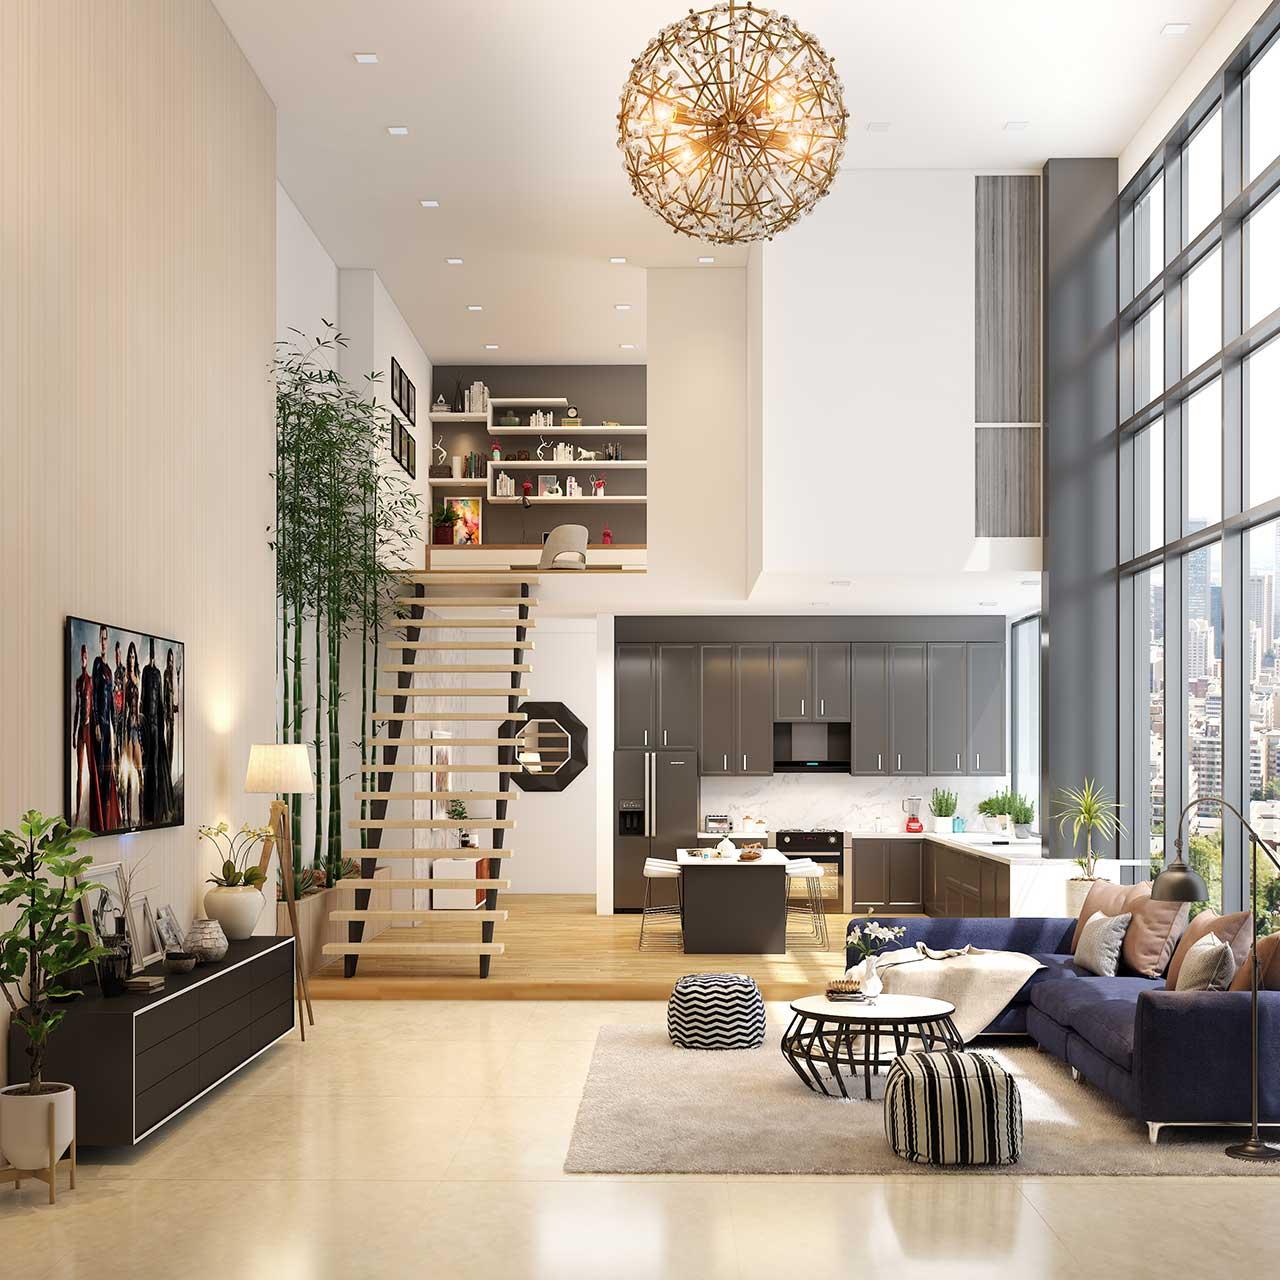 8 Lighting Ideas For Your Home Design Cafe